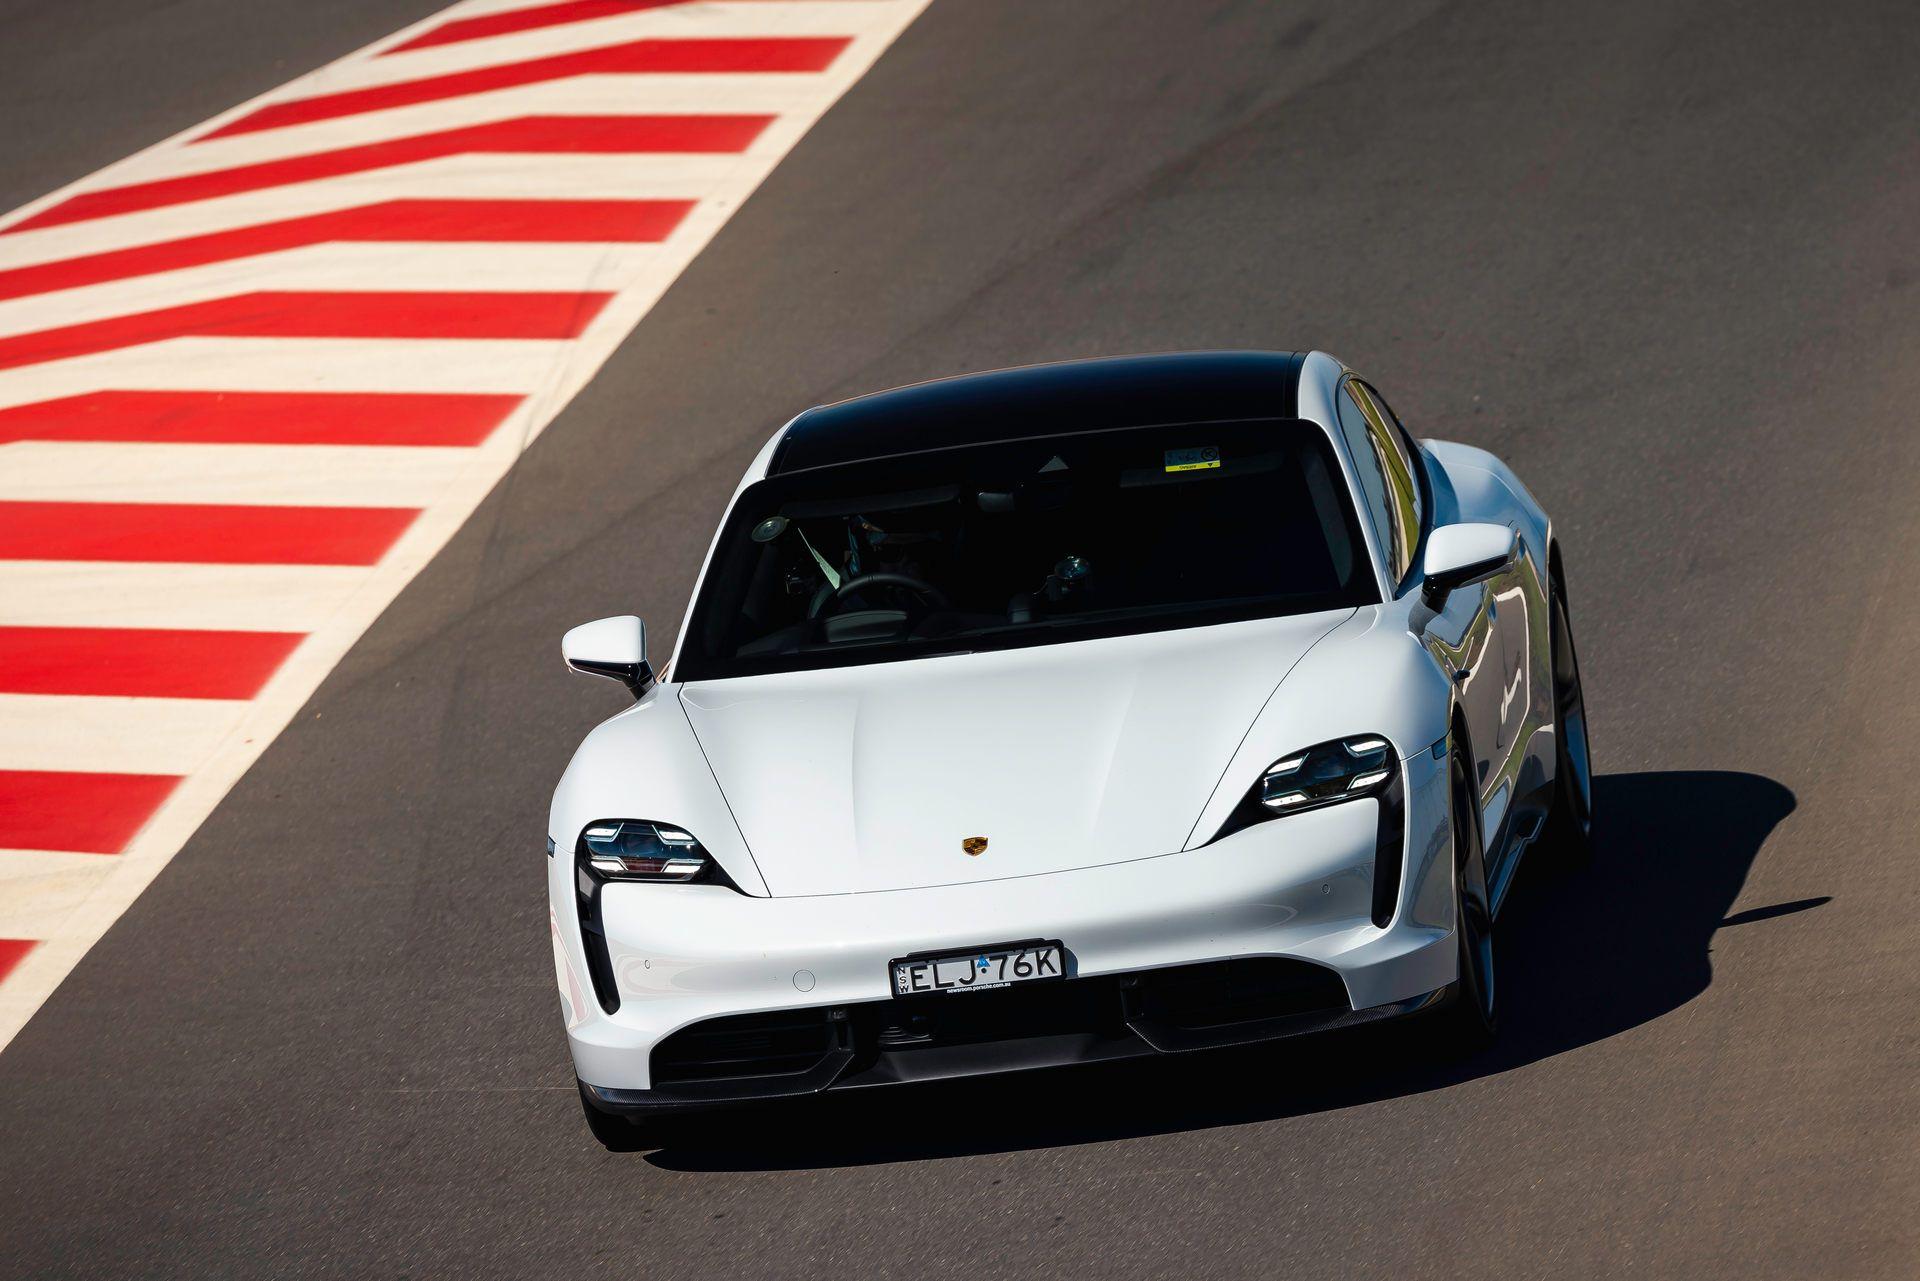 Porsche-Taycan-Turbo-S-The-Bend-Motorsport-Park-3